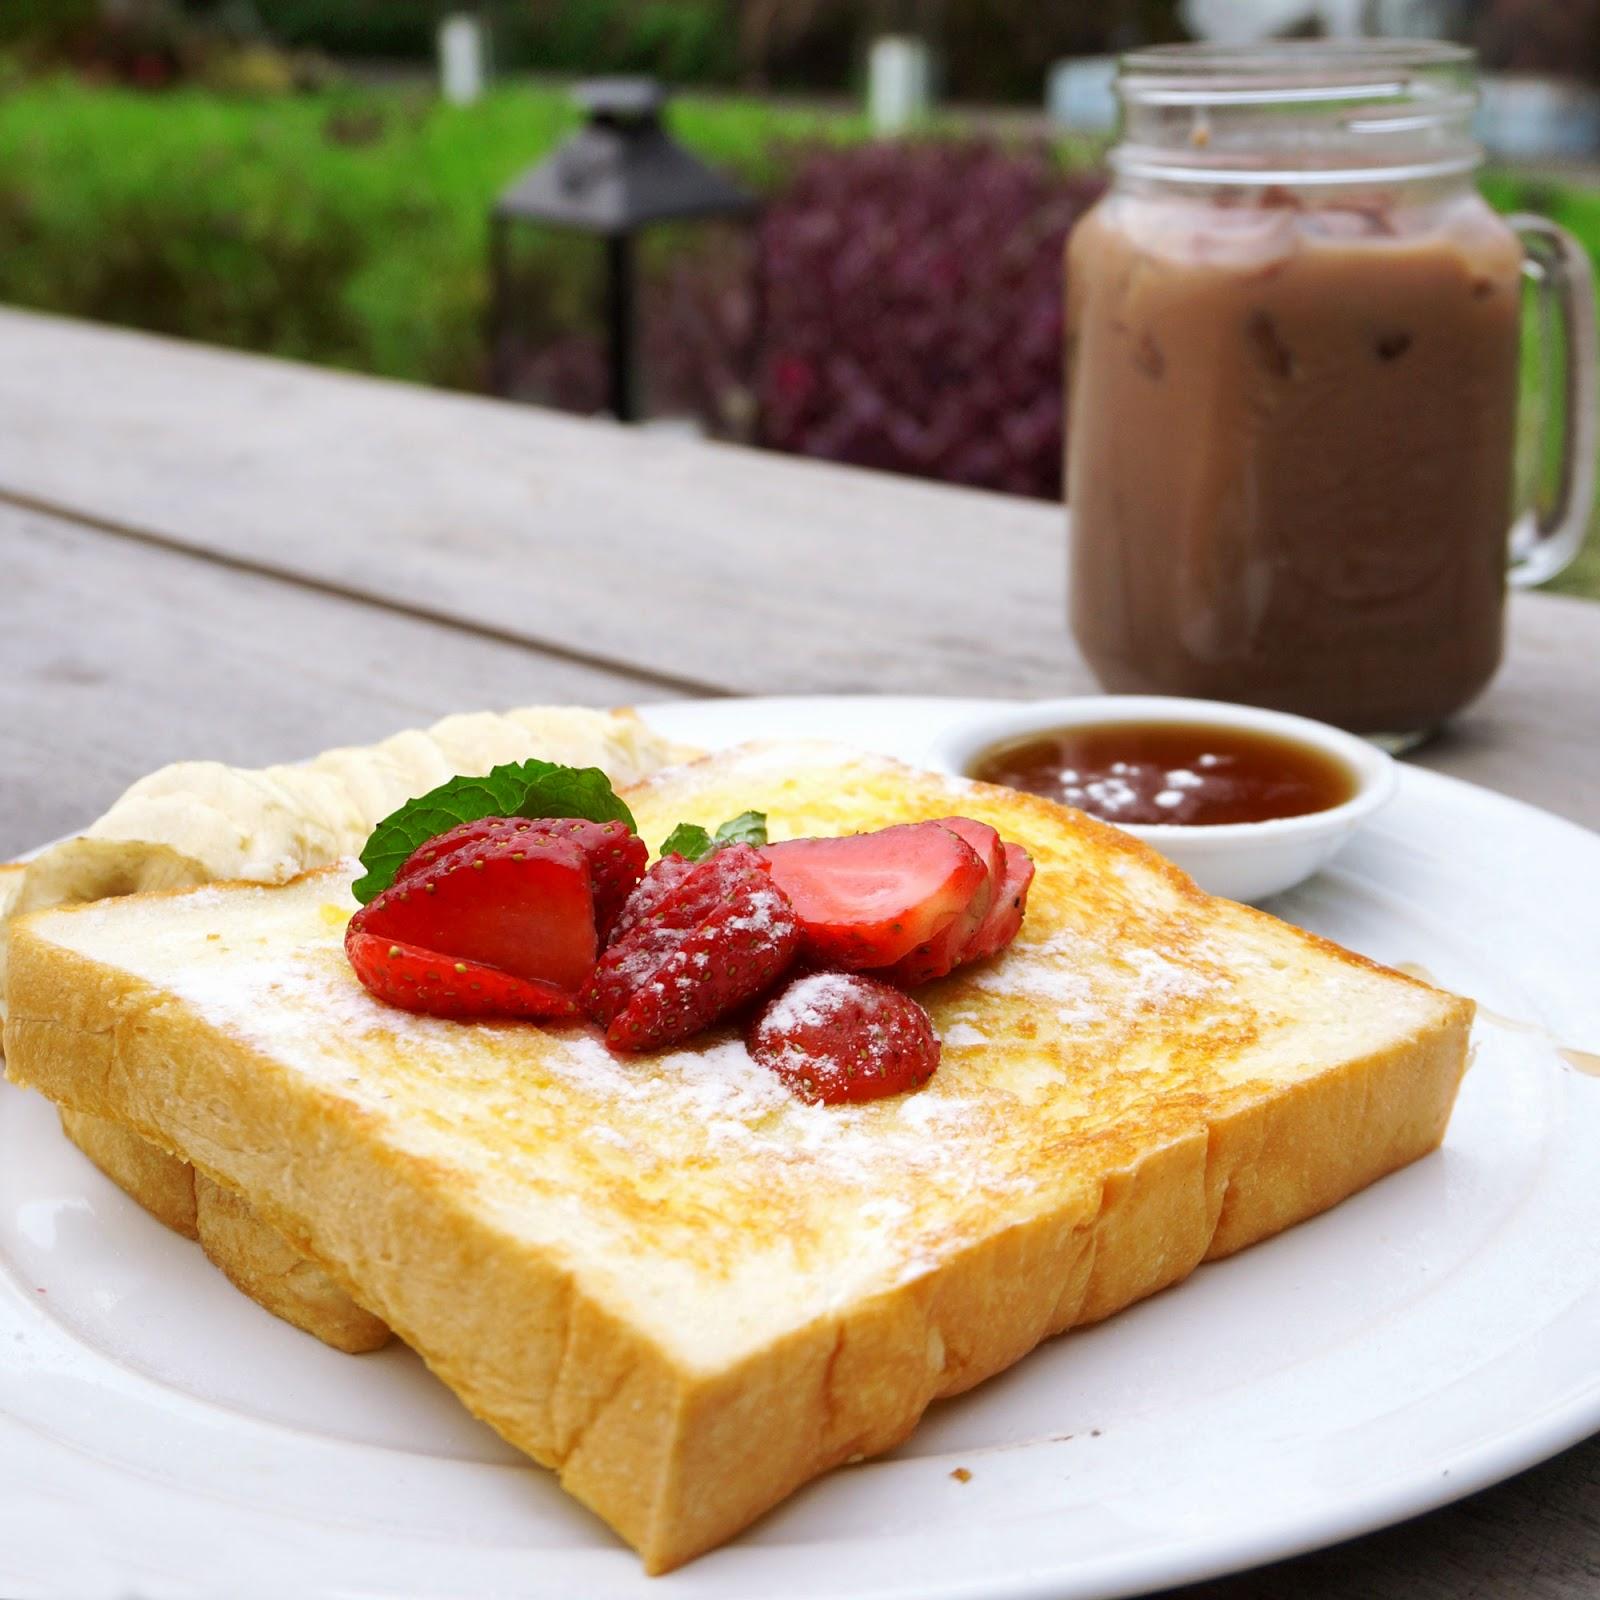 Makanan dan Minuman Lemongrass Bogor